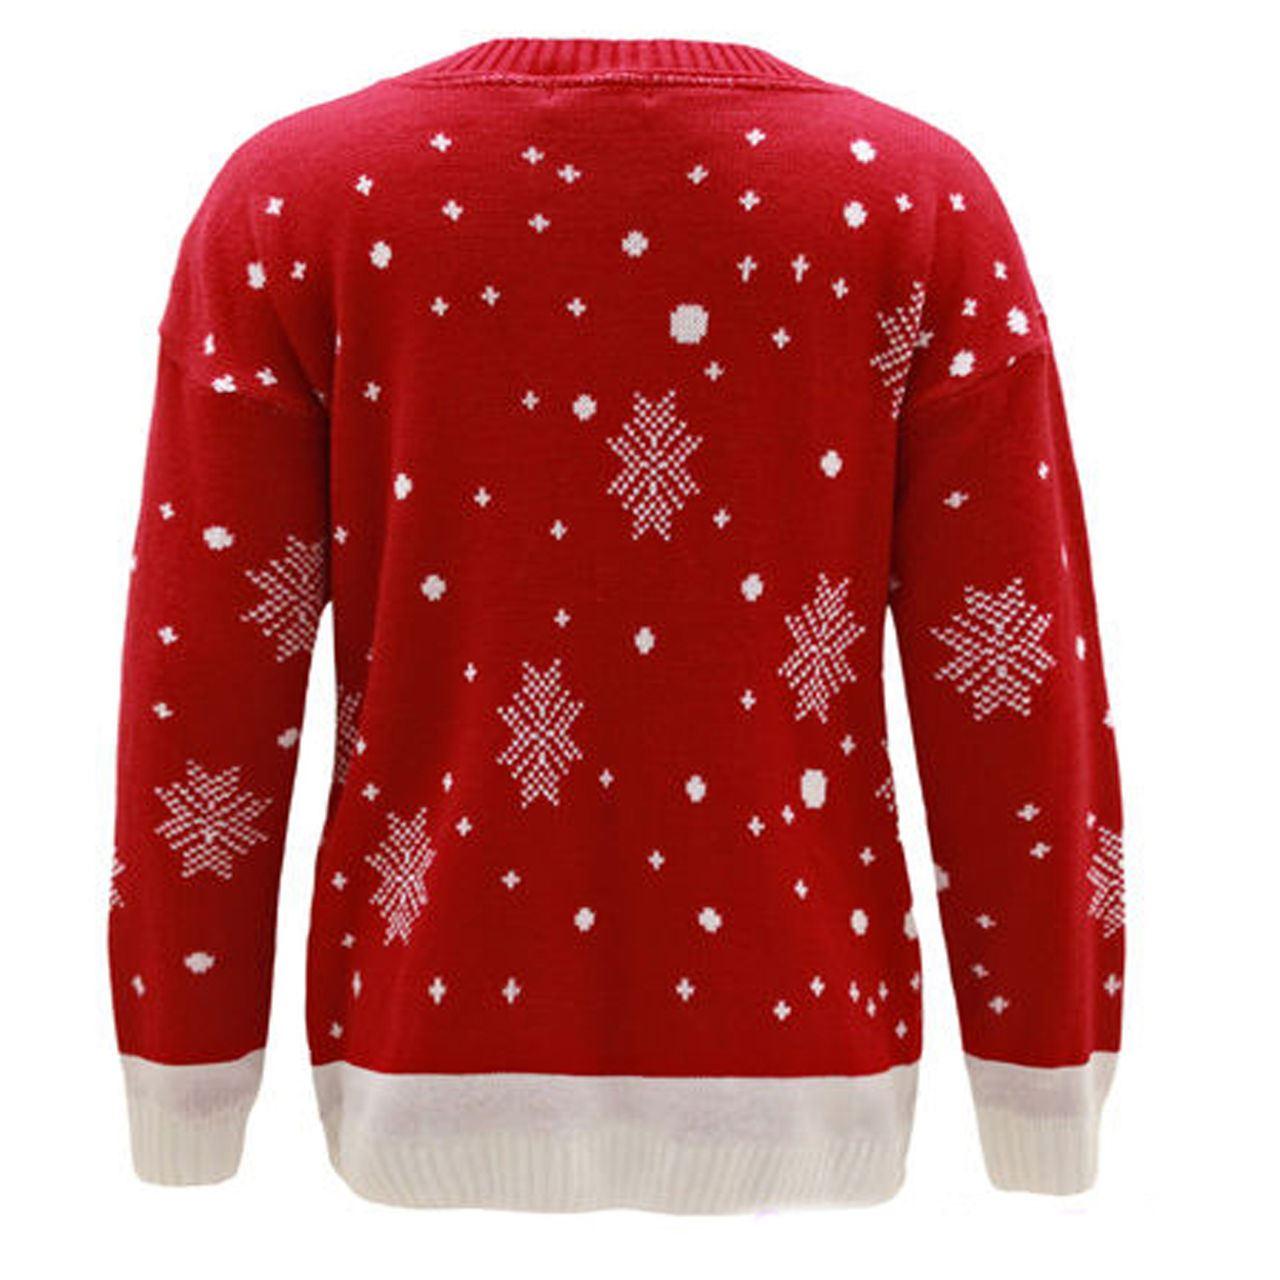 New-Ladies-Women-Men-Knitted-Rudolph-Reindeer-Xmas-Christmas-Jumper-Sweater-Top thumbnail 7